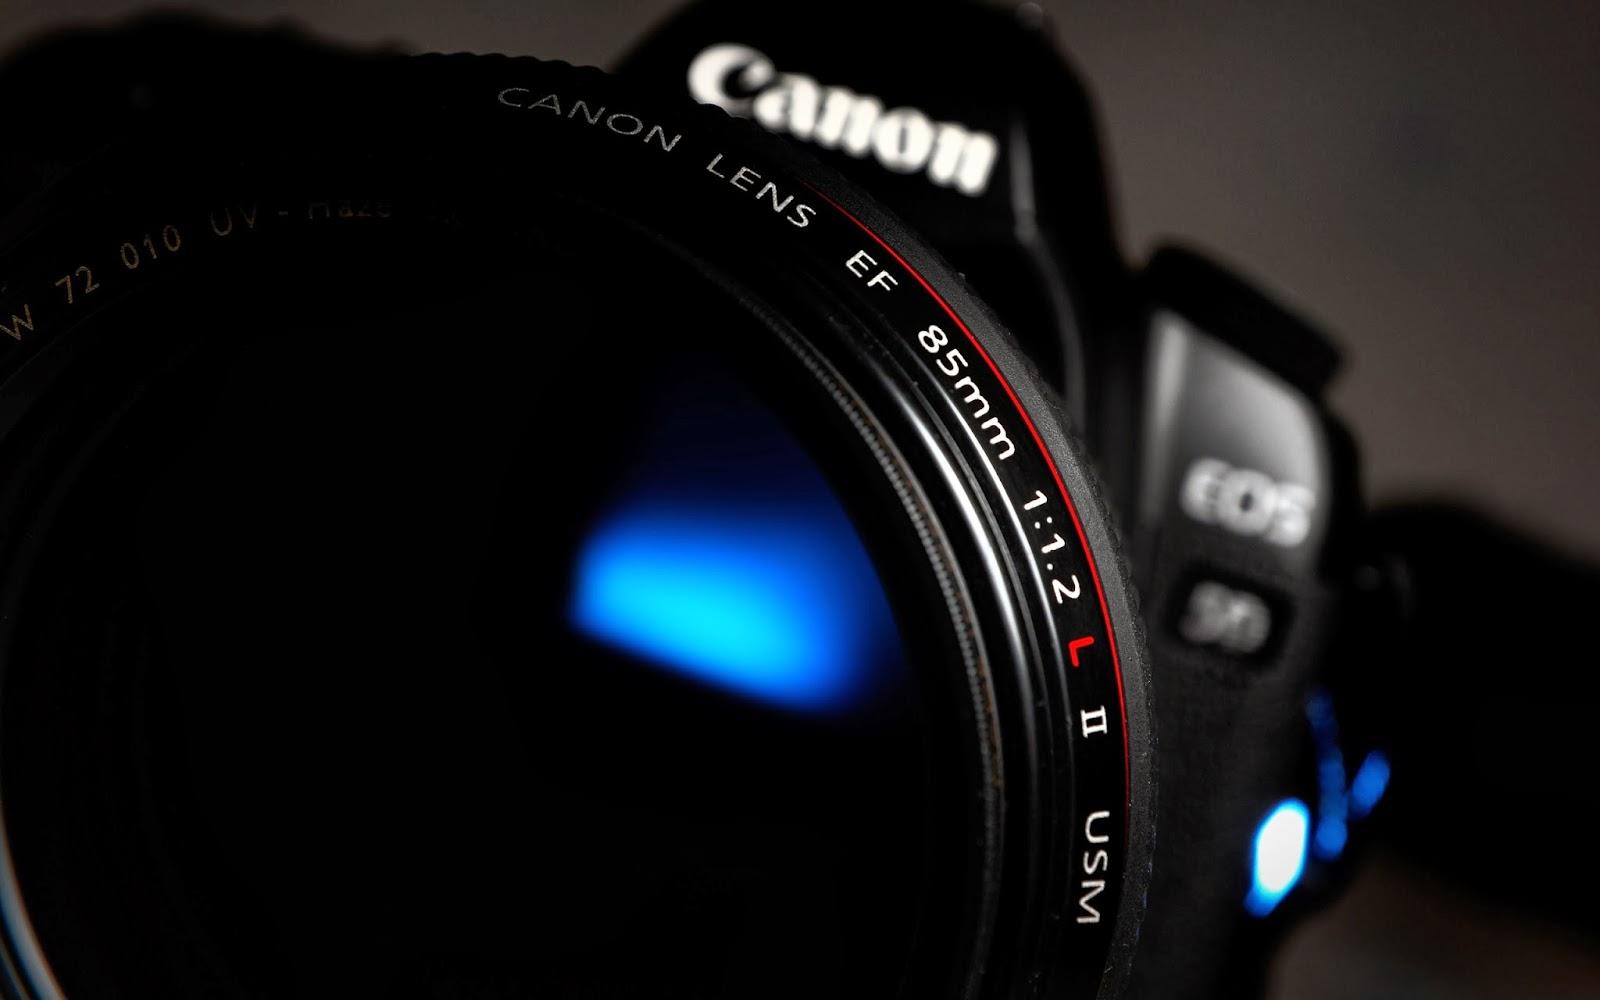 canon-camera-close-up-wallpaper-2560x1600